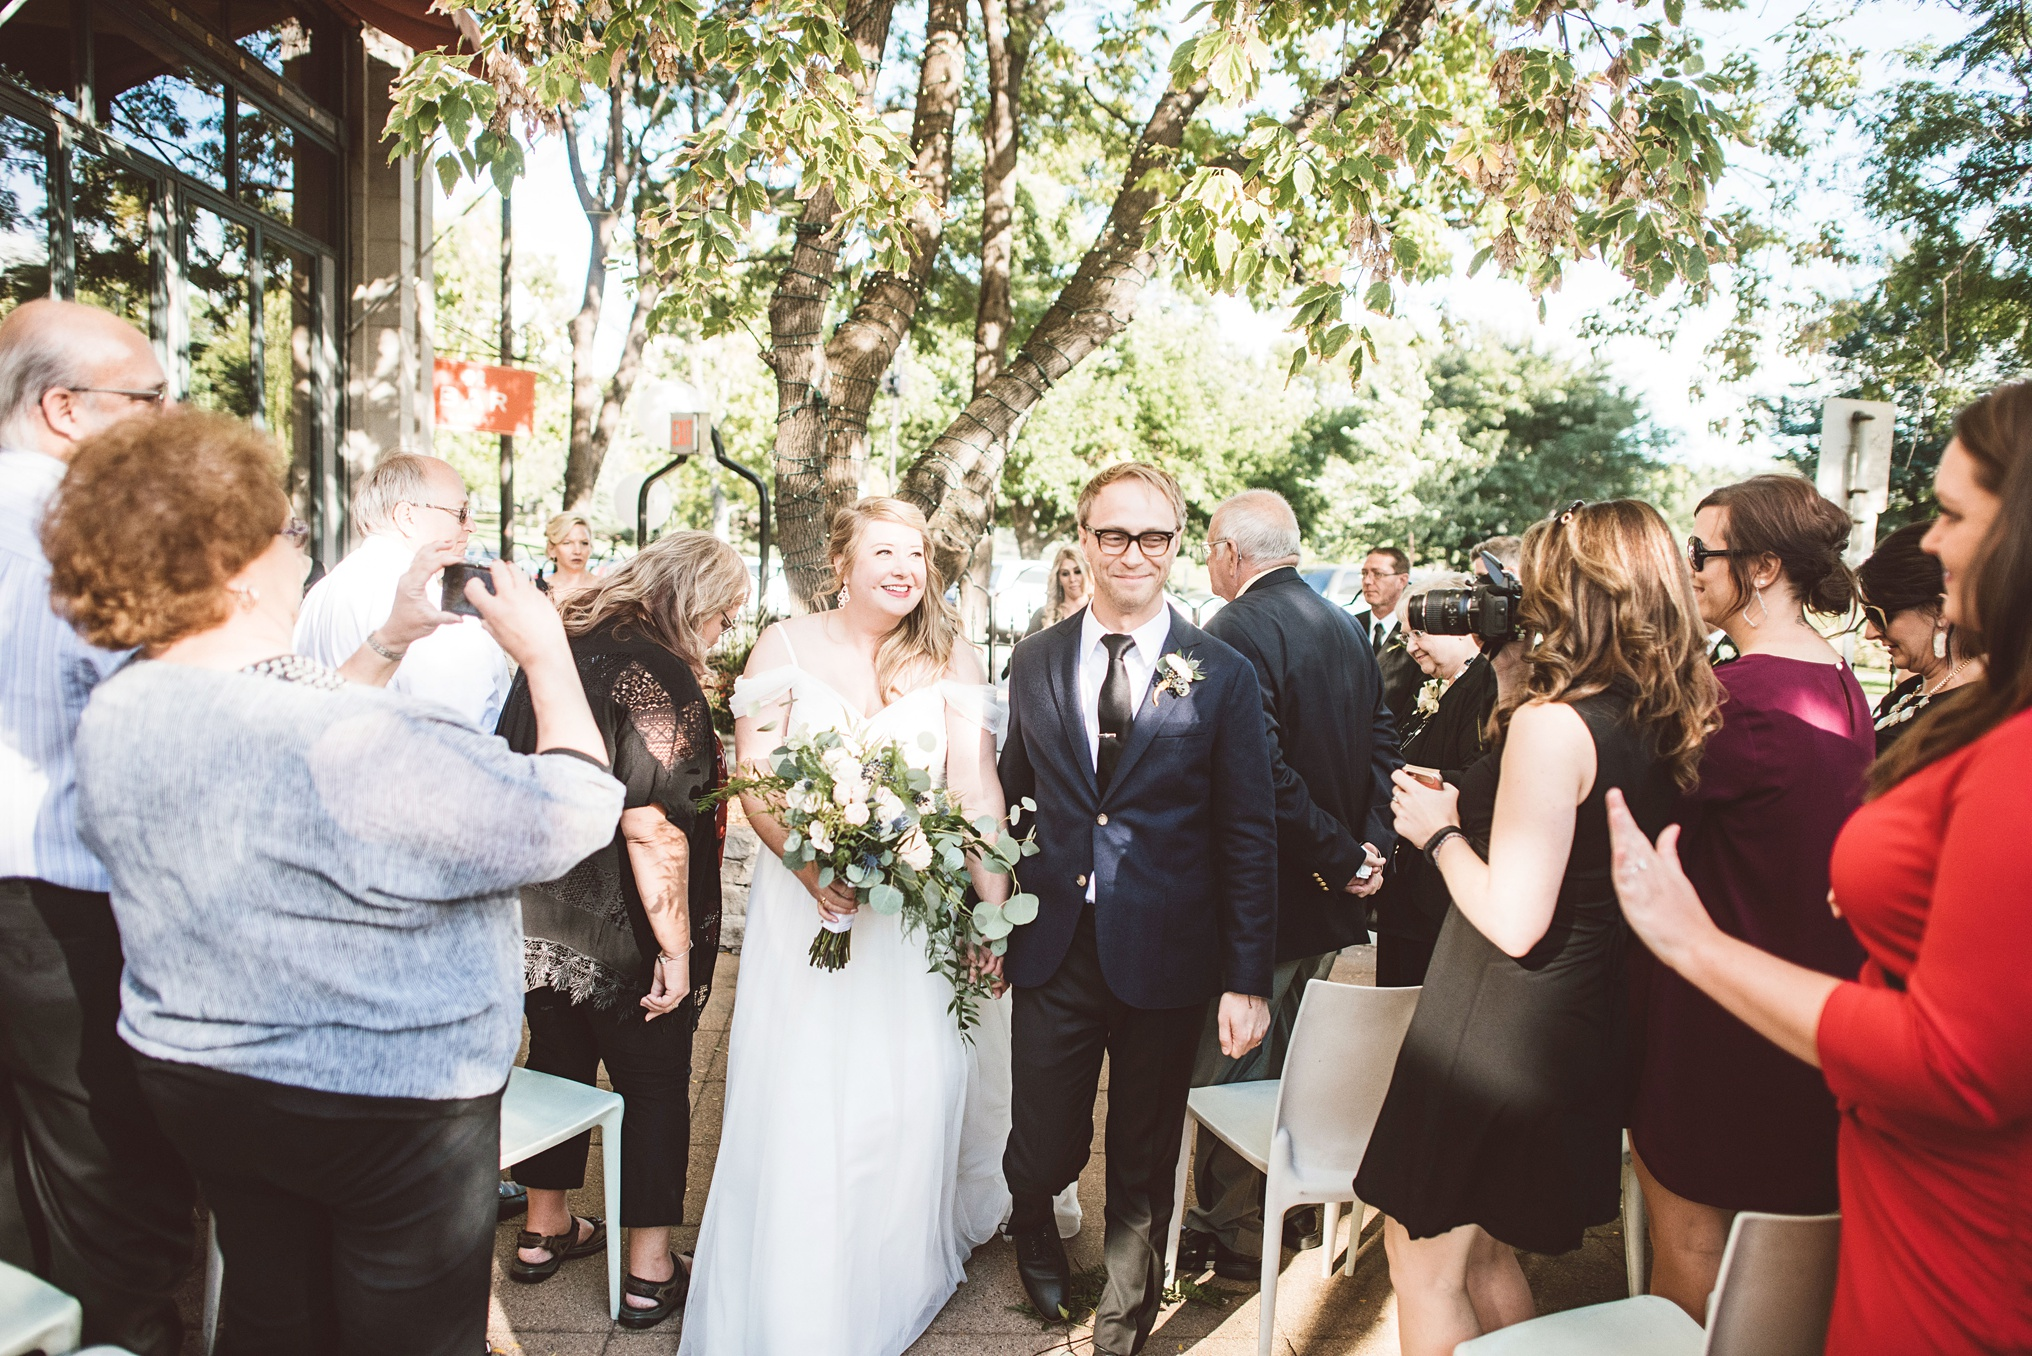 best_wedding_photography_2017_by_lucas_botz_photography_098.jpg